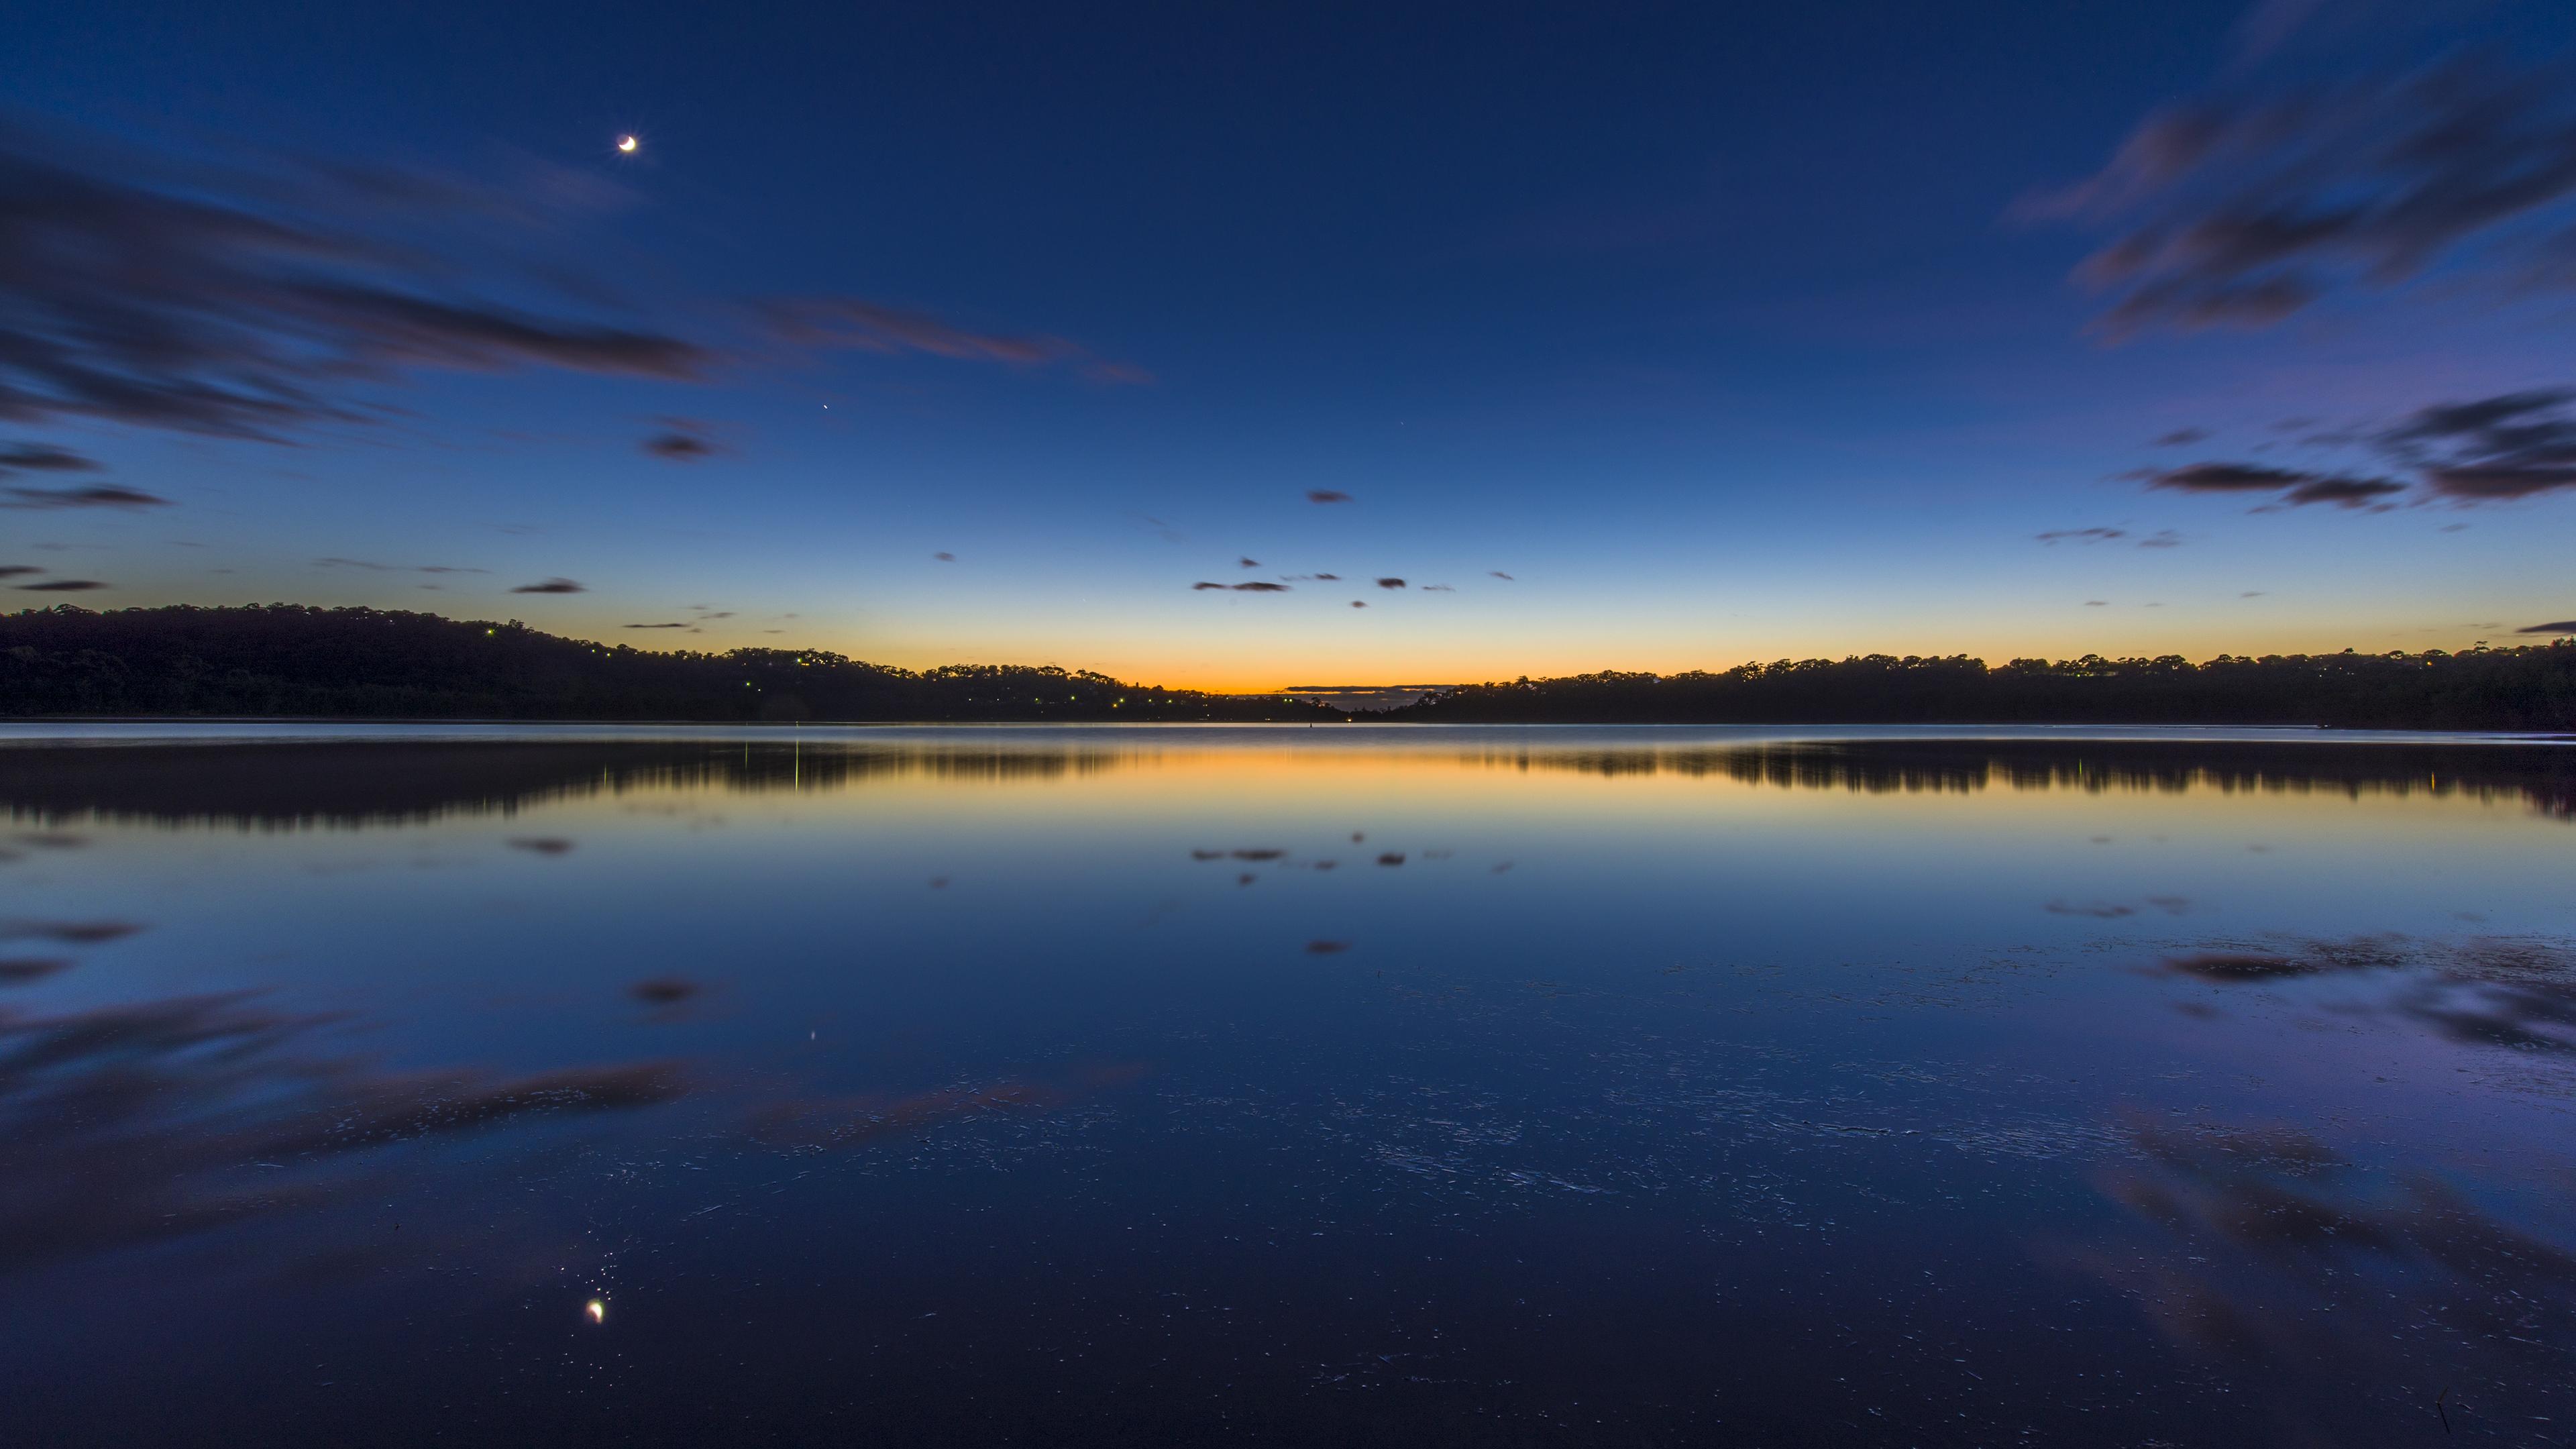 4k Sunset 271 HD Wallpapers